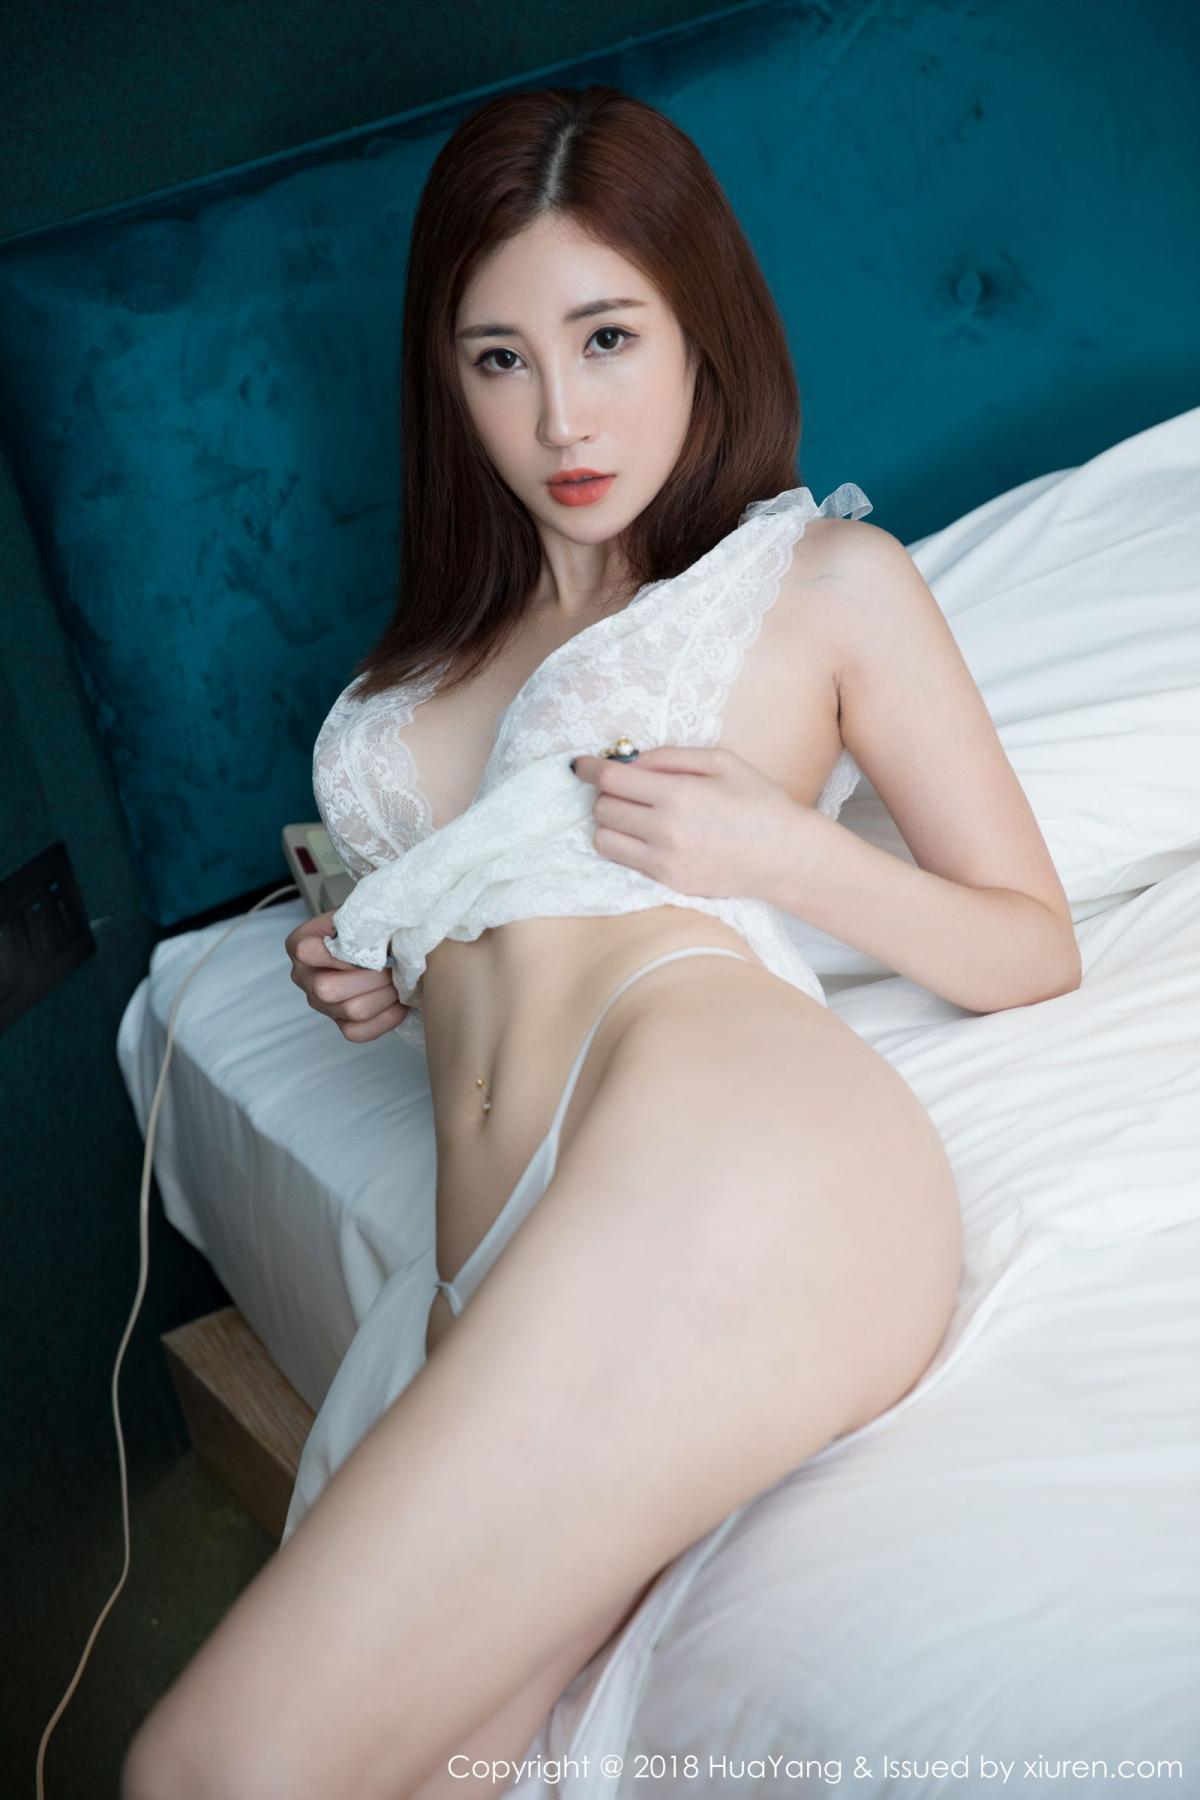 [Huayang] Vol.077 Sun Meng Yao 33P, Adult, Big Booty, HuaYang, Sun Meng Yao, Underwear